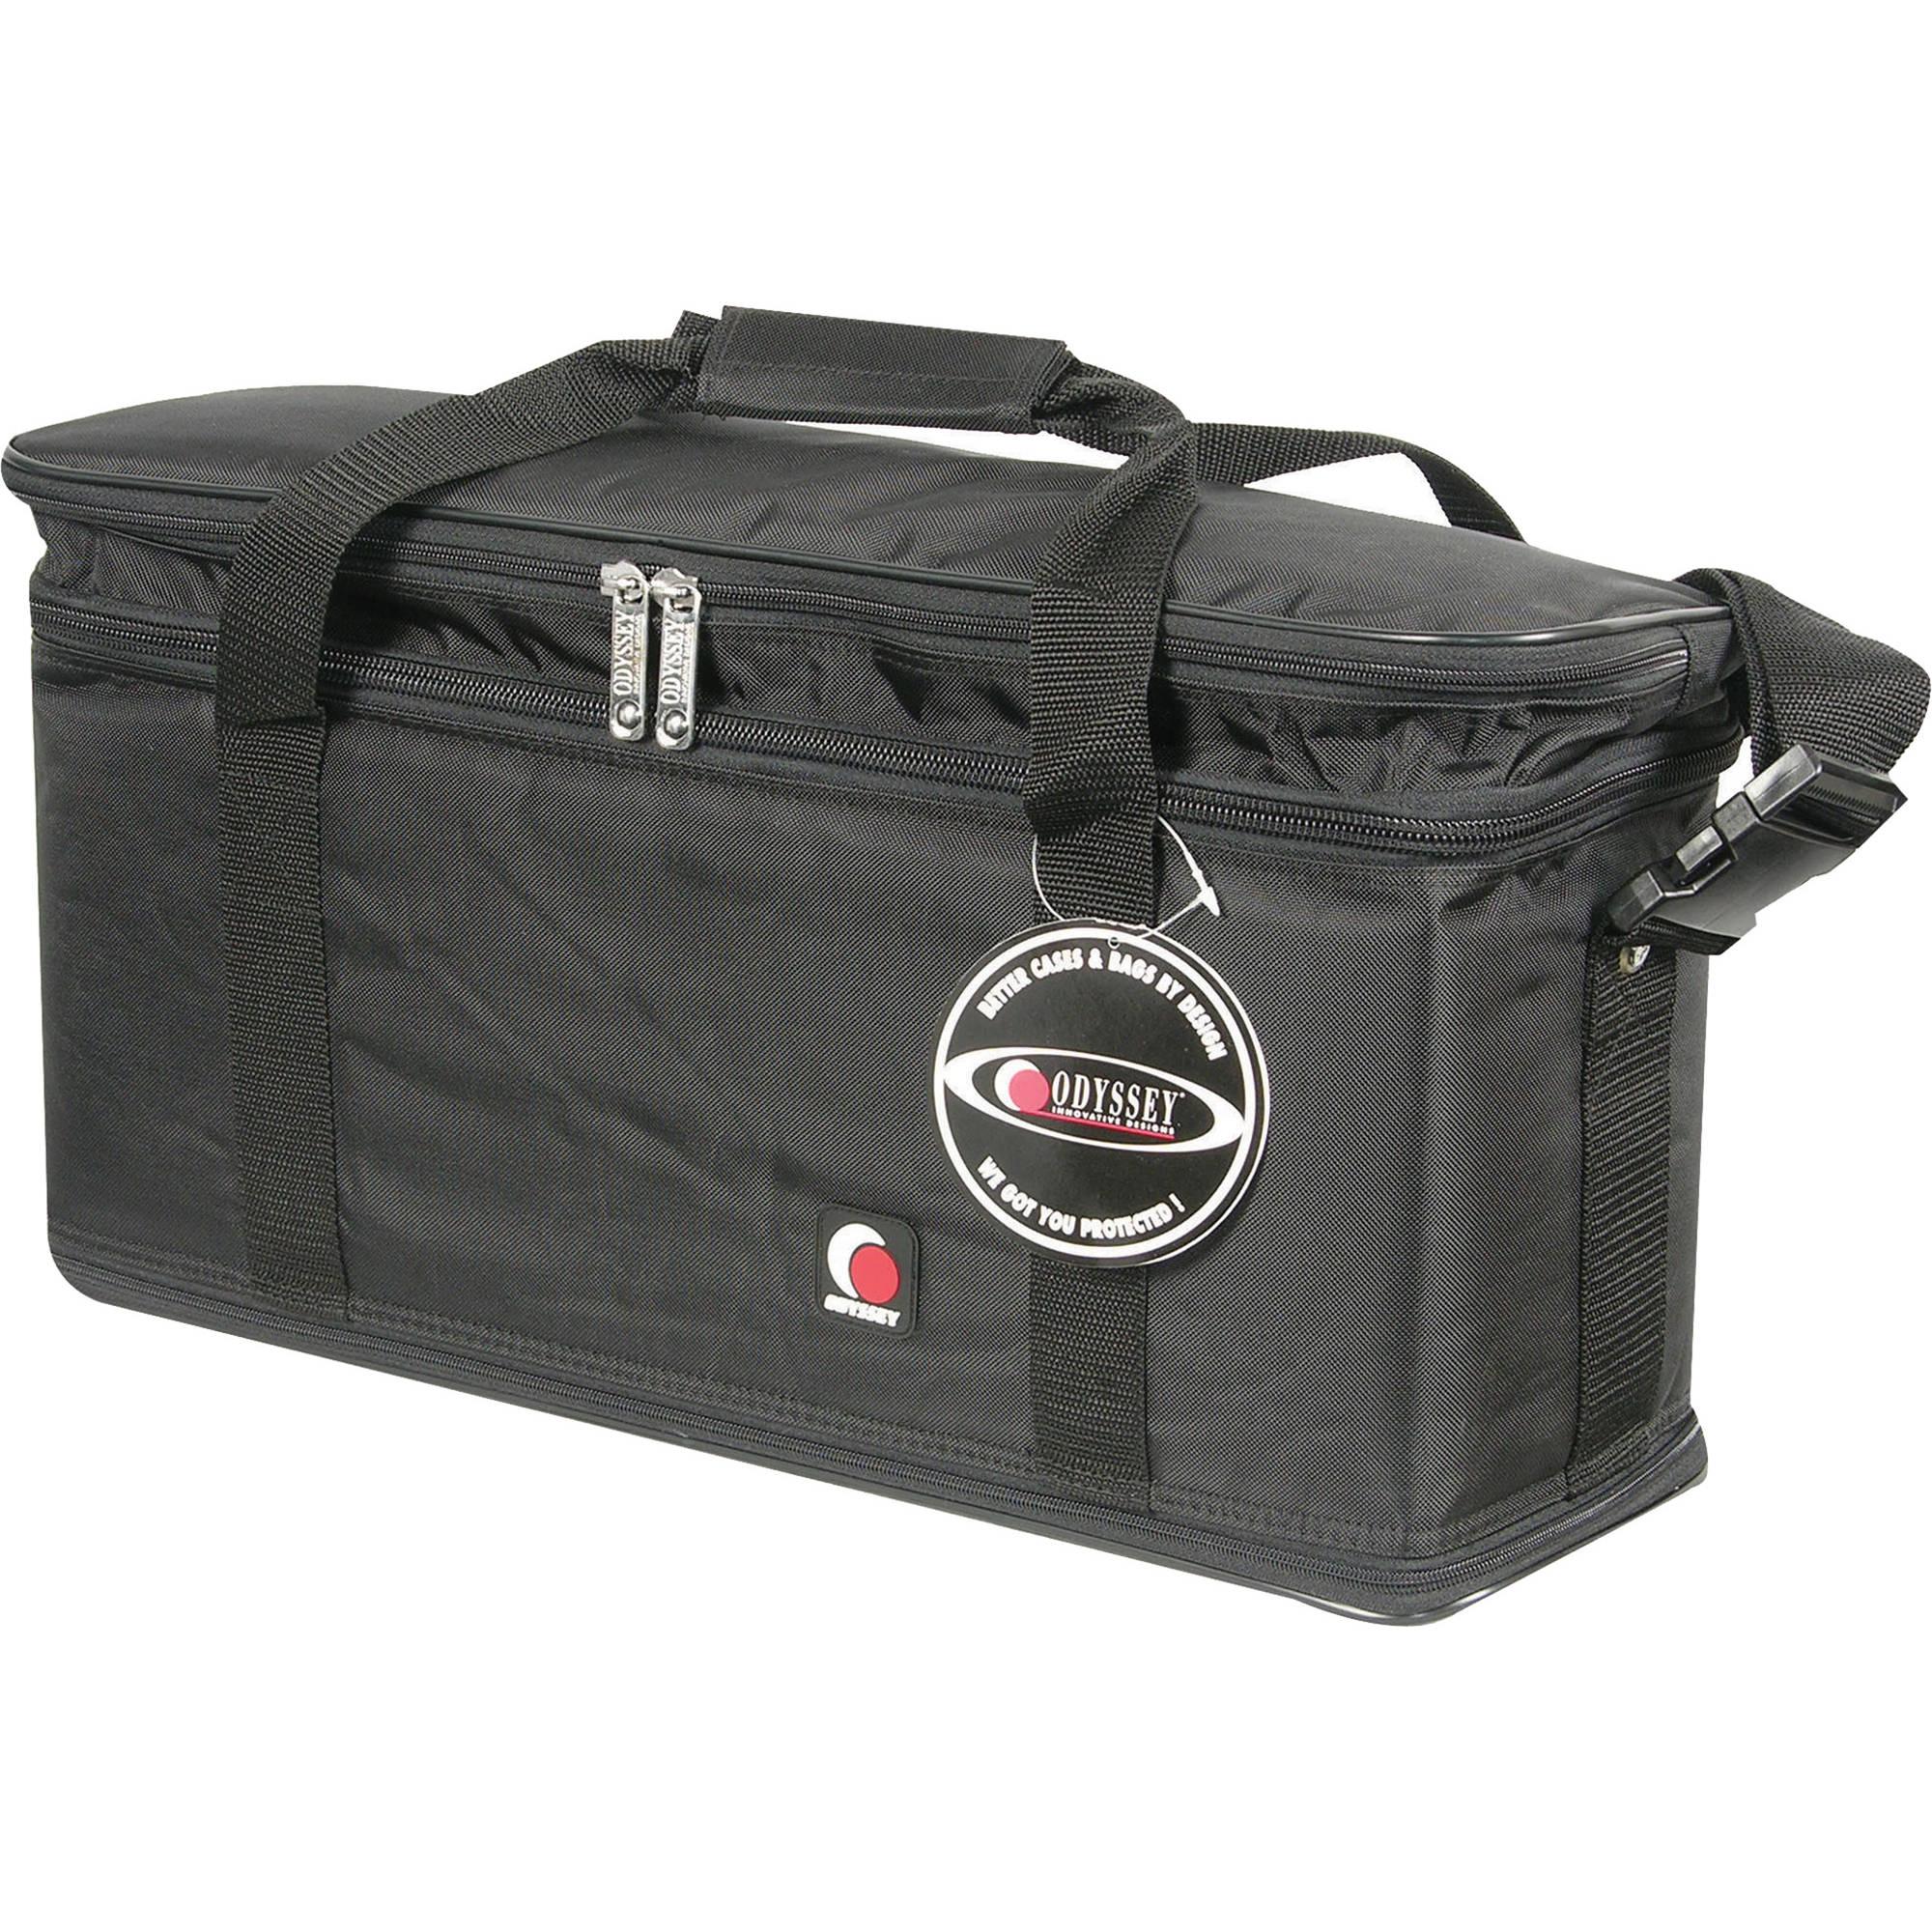 Odyssey Innovative Designs Br308 Bag Style Rack Case Black